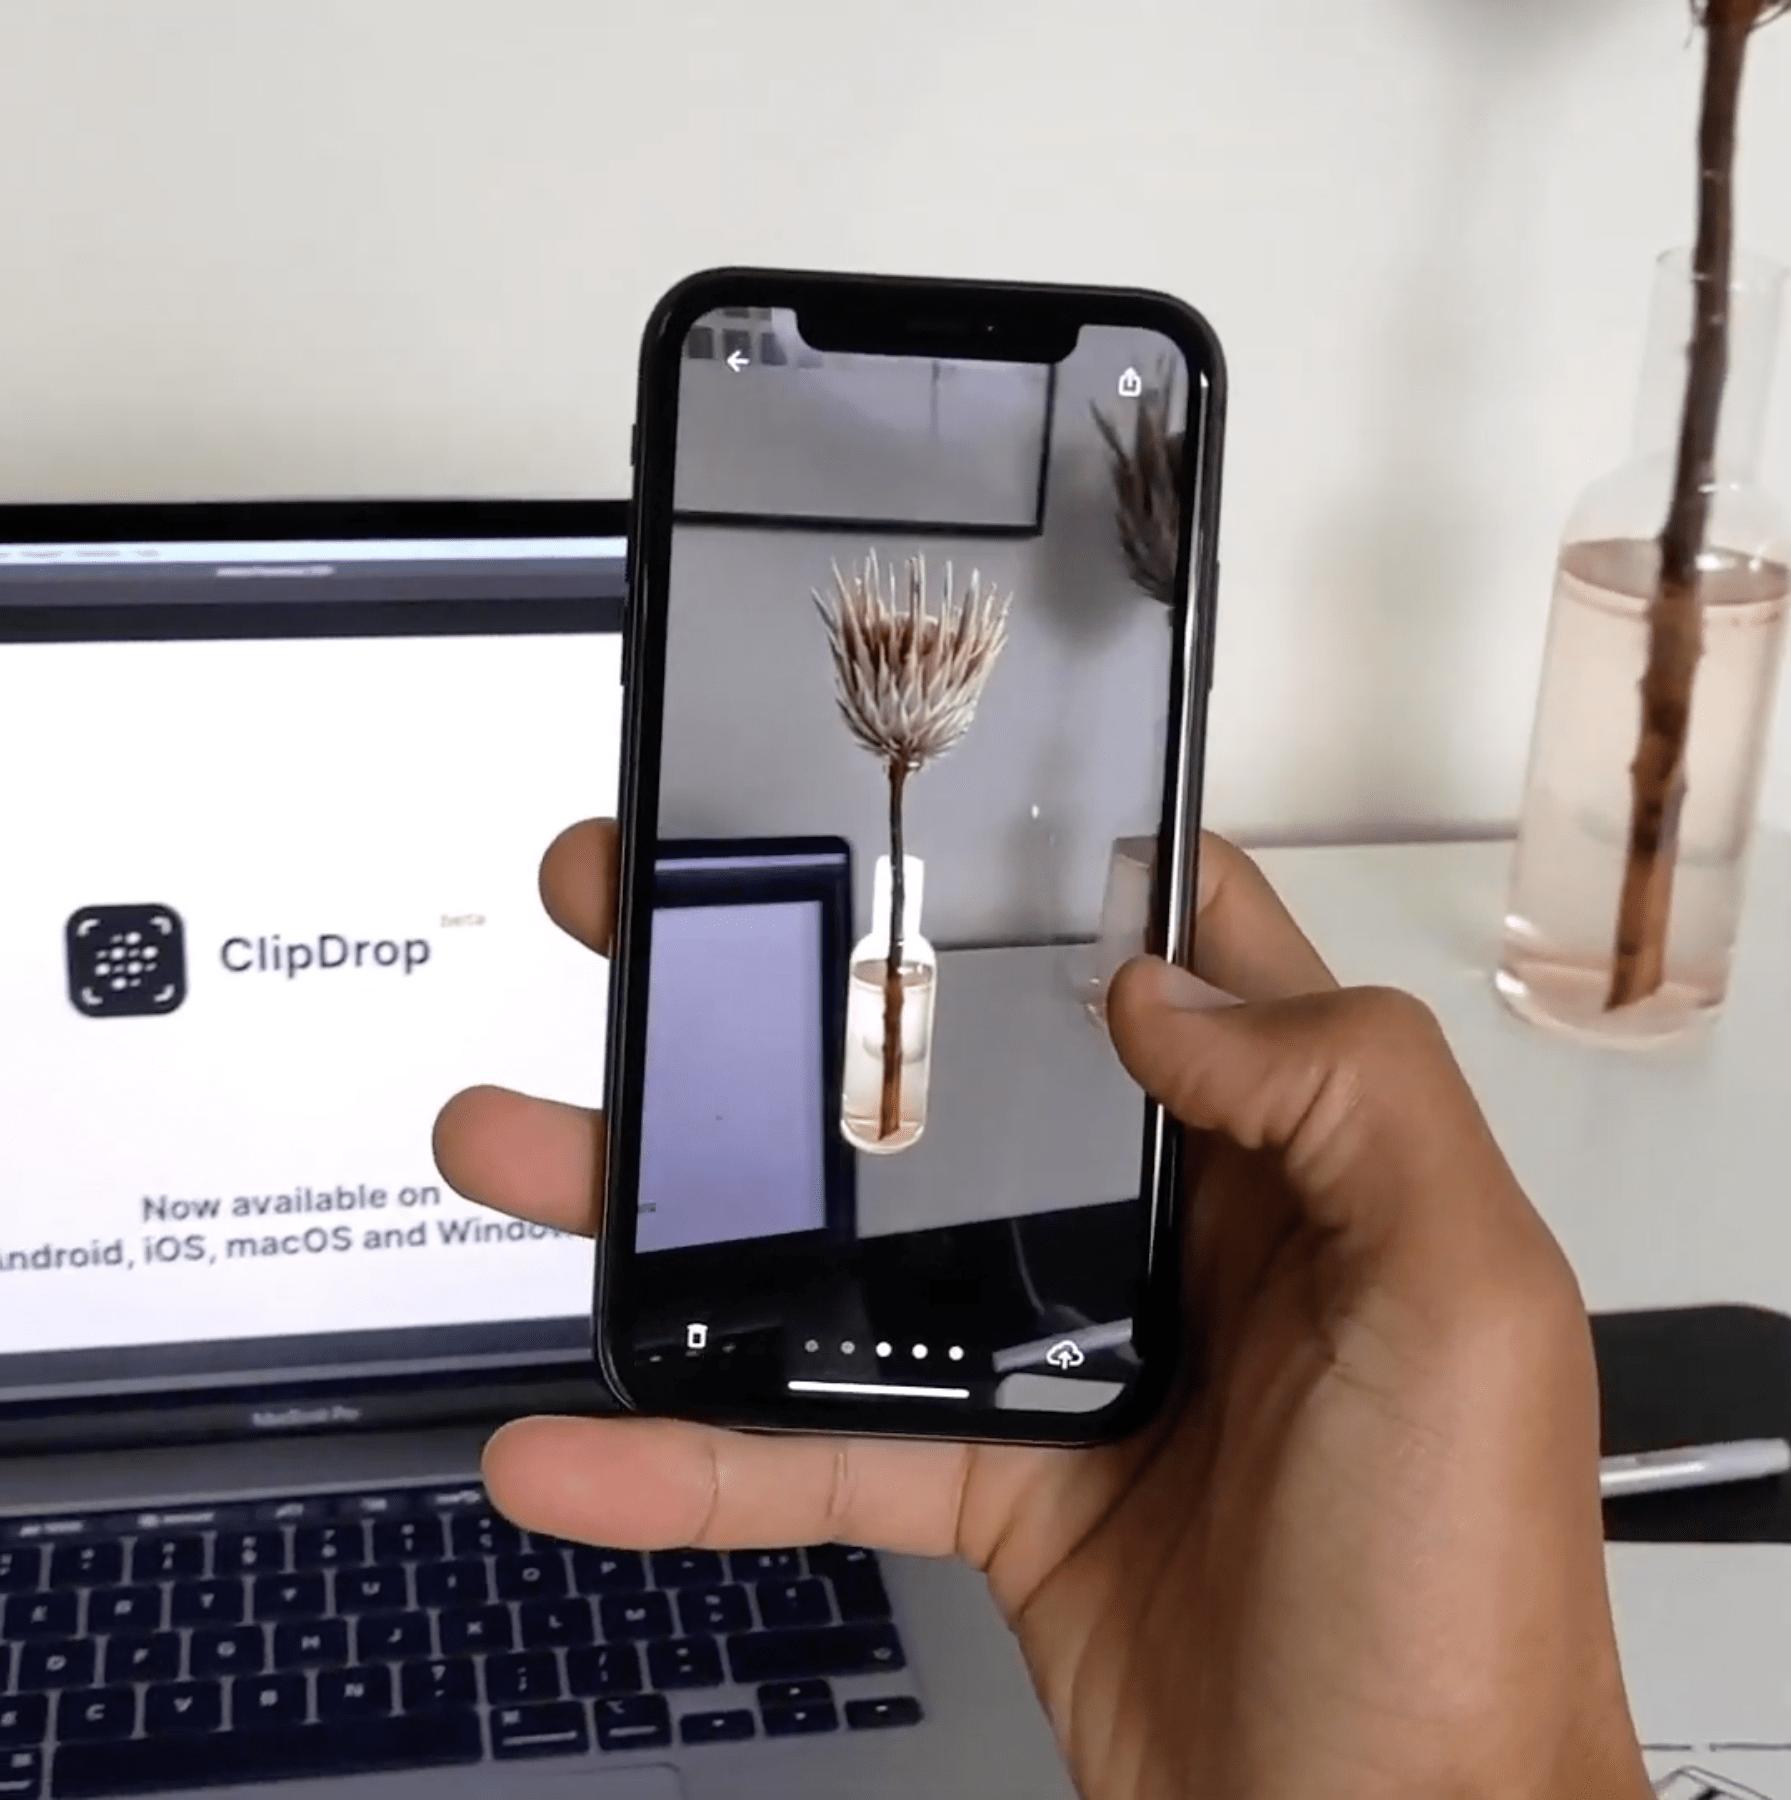 clipdrop app copy paste process video screenshot